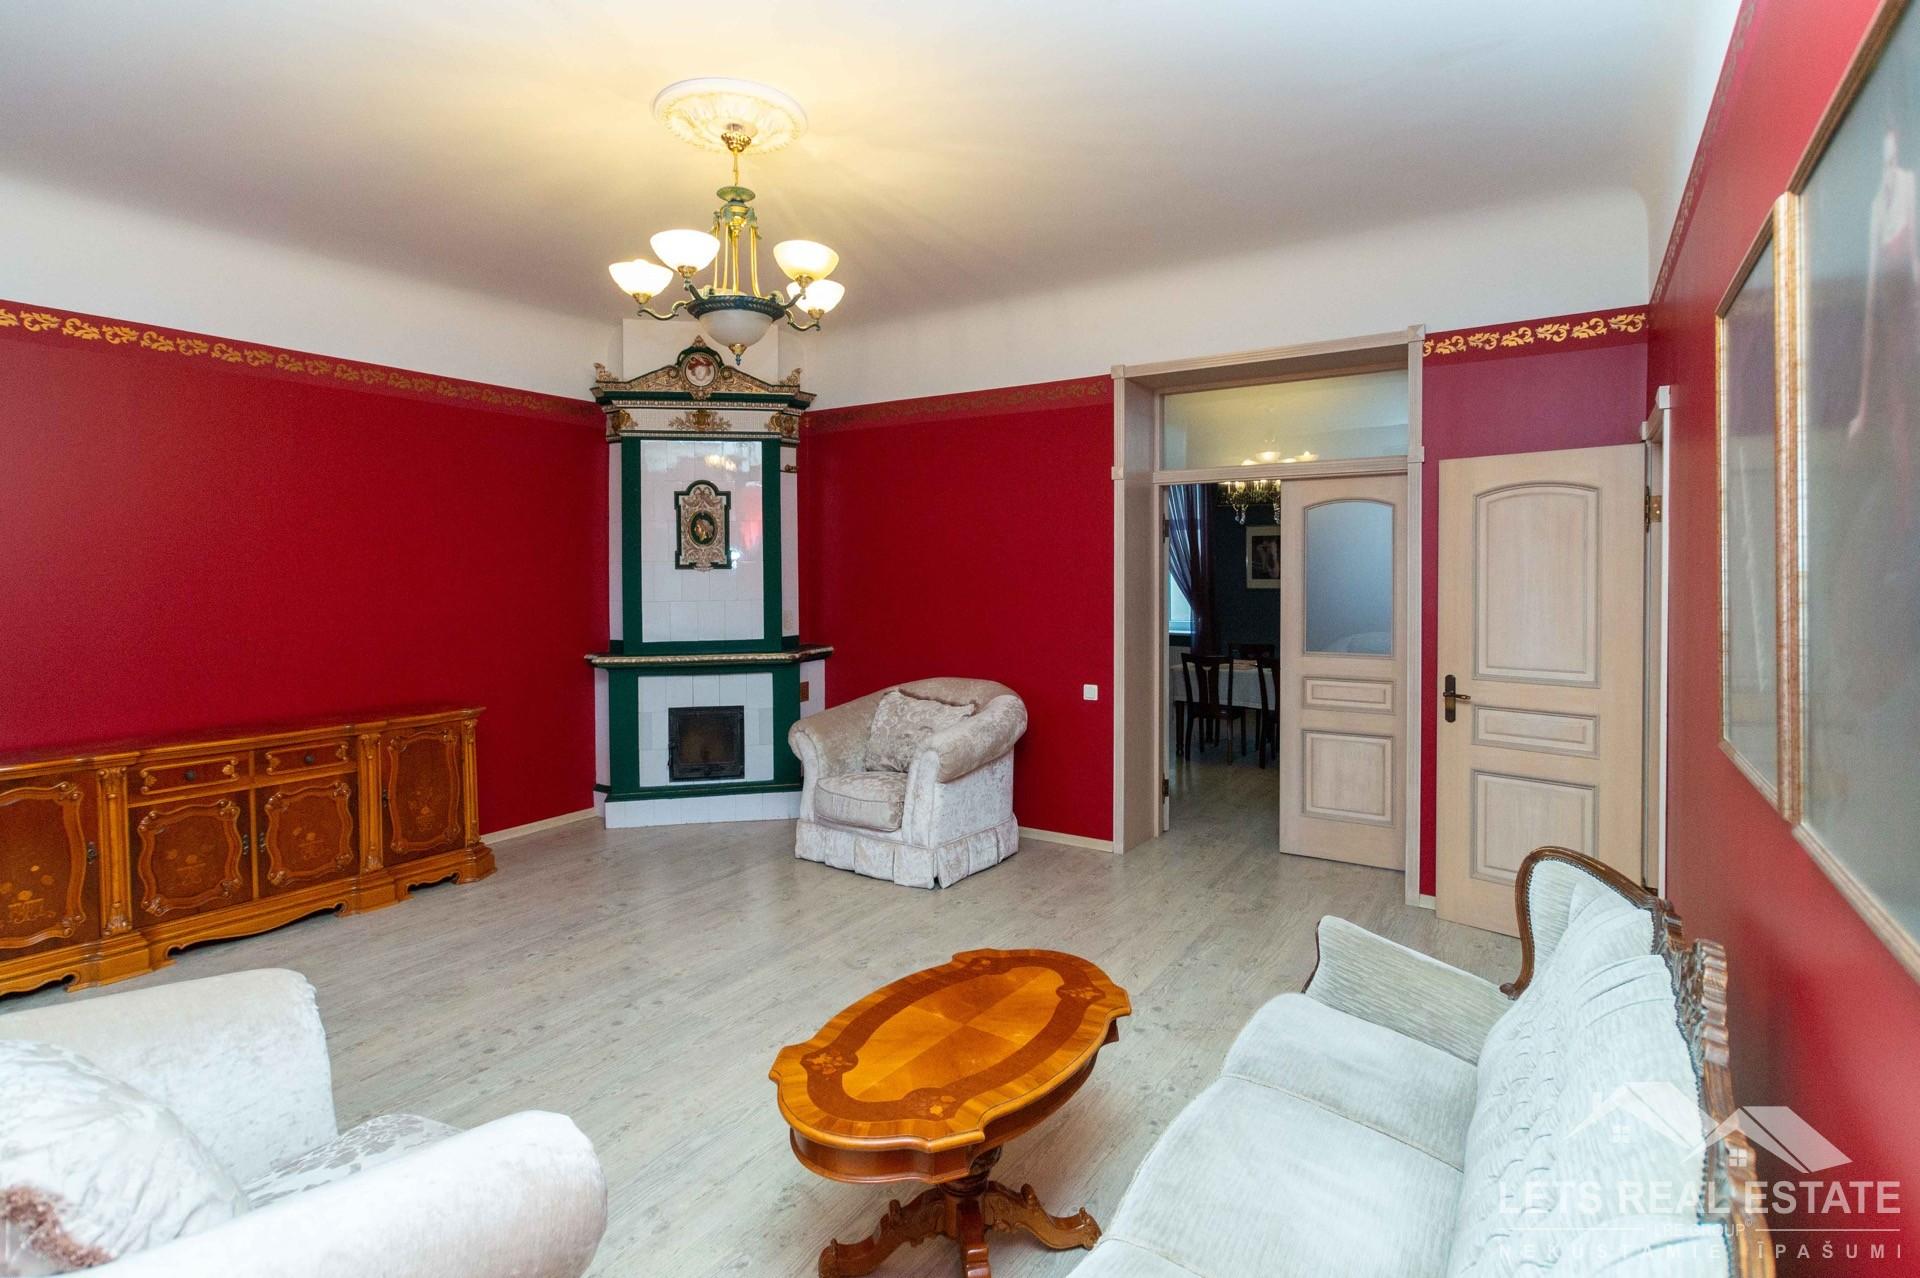 5-комнатная квартира, Ул.Дзирнаву 62, Центр, Рига, Латвия.